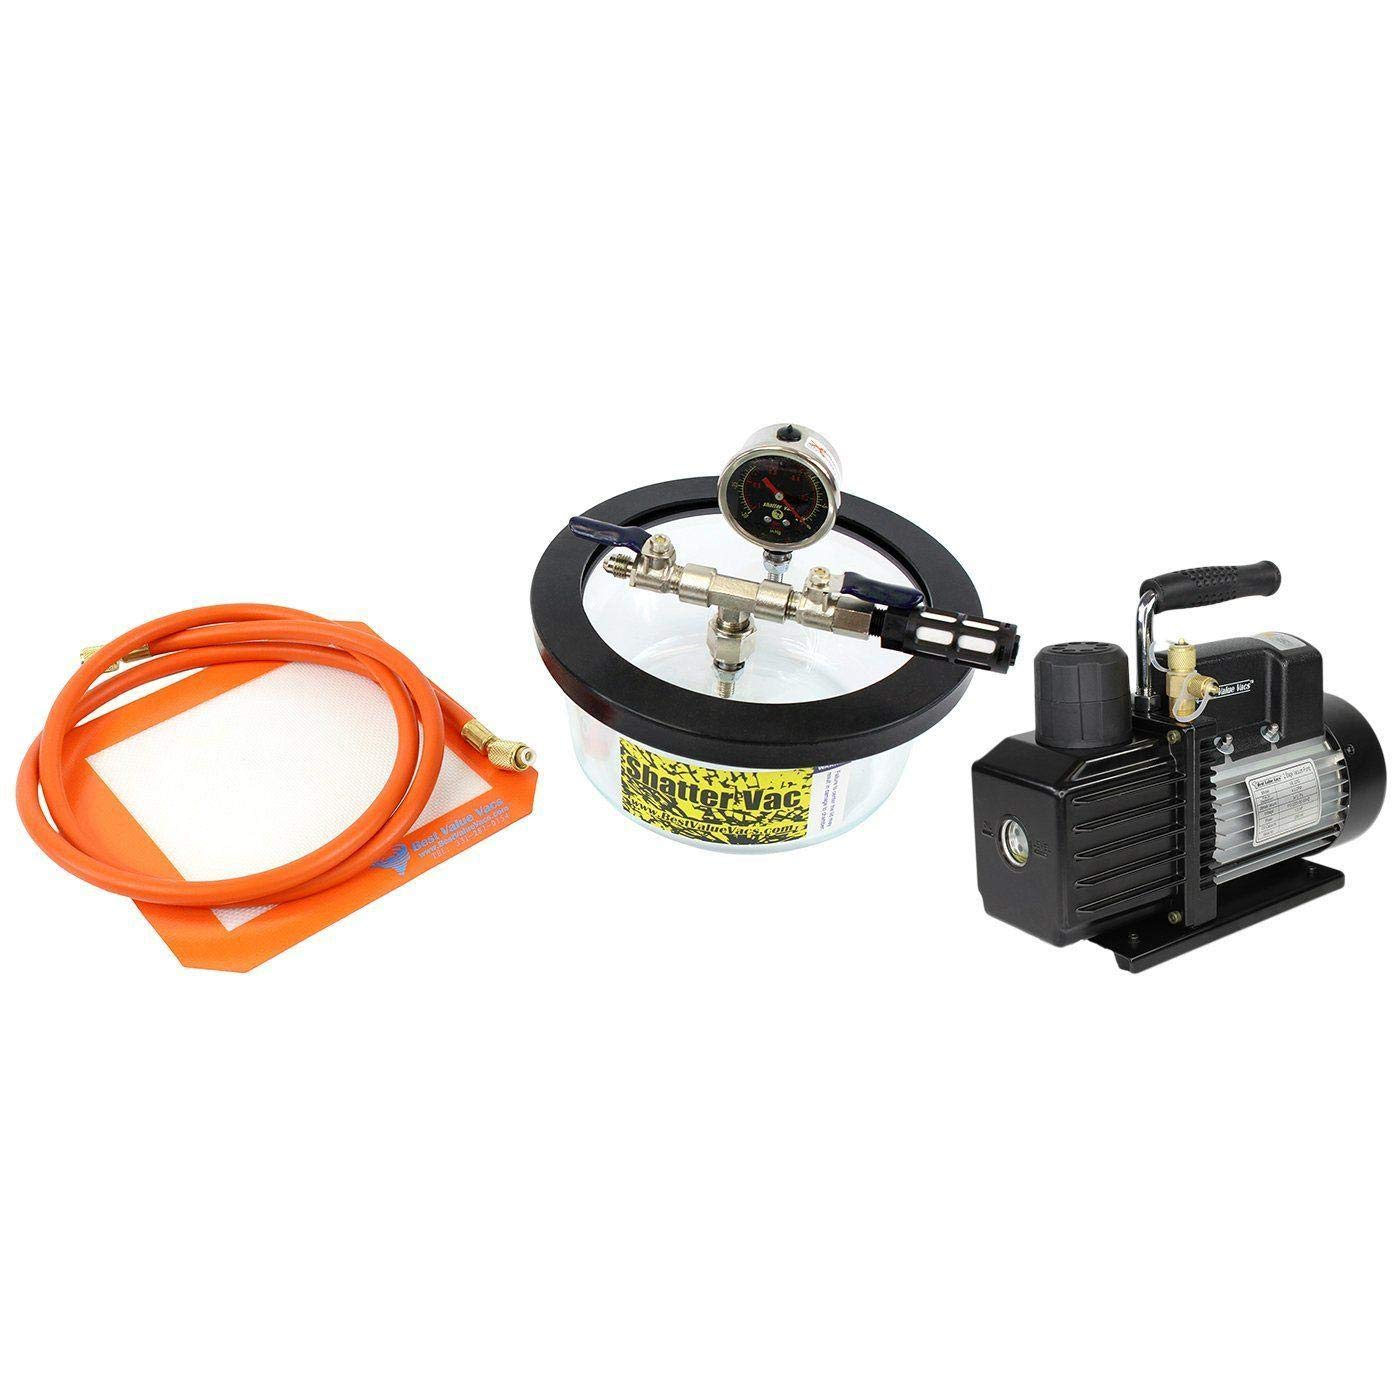 SVac 1.75 Quart Pyrex Vacuum Chamber and VE115 3CFM Single Stage Vacuum Pump Kit